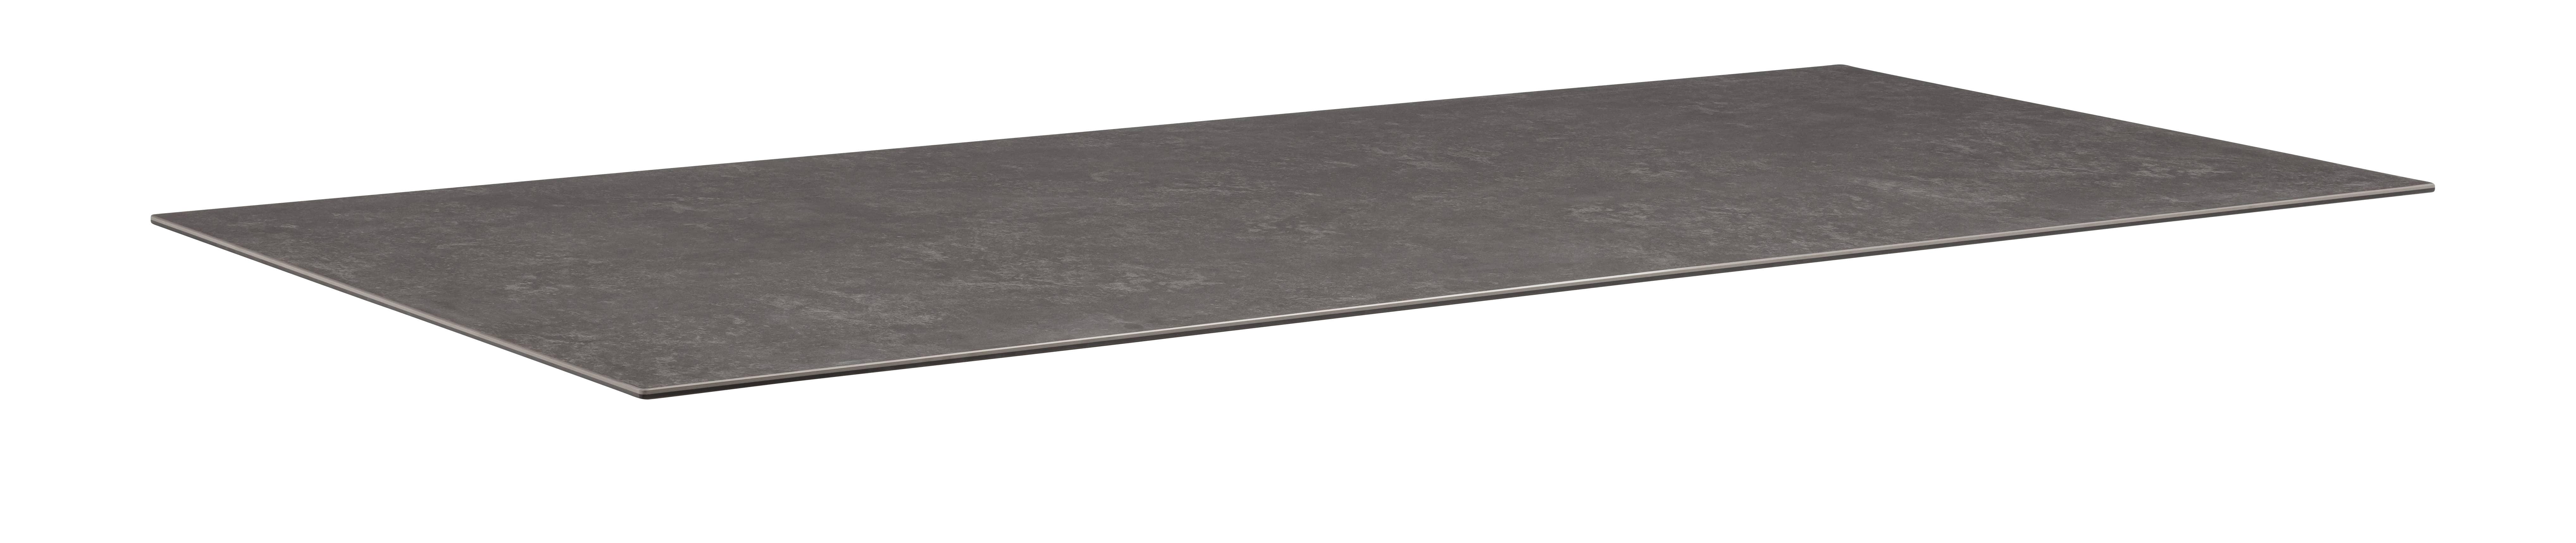 KERAMIK-GLAS Tischplatte 220 x 95 cm